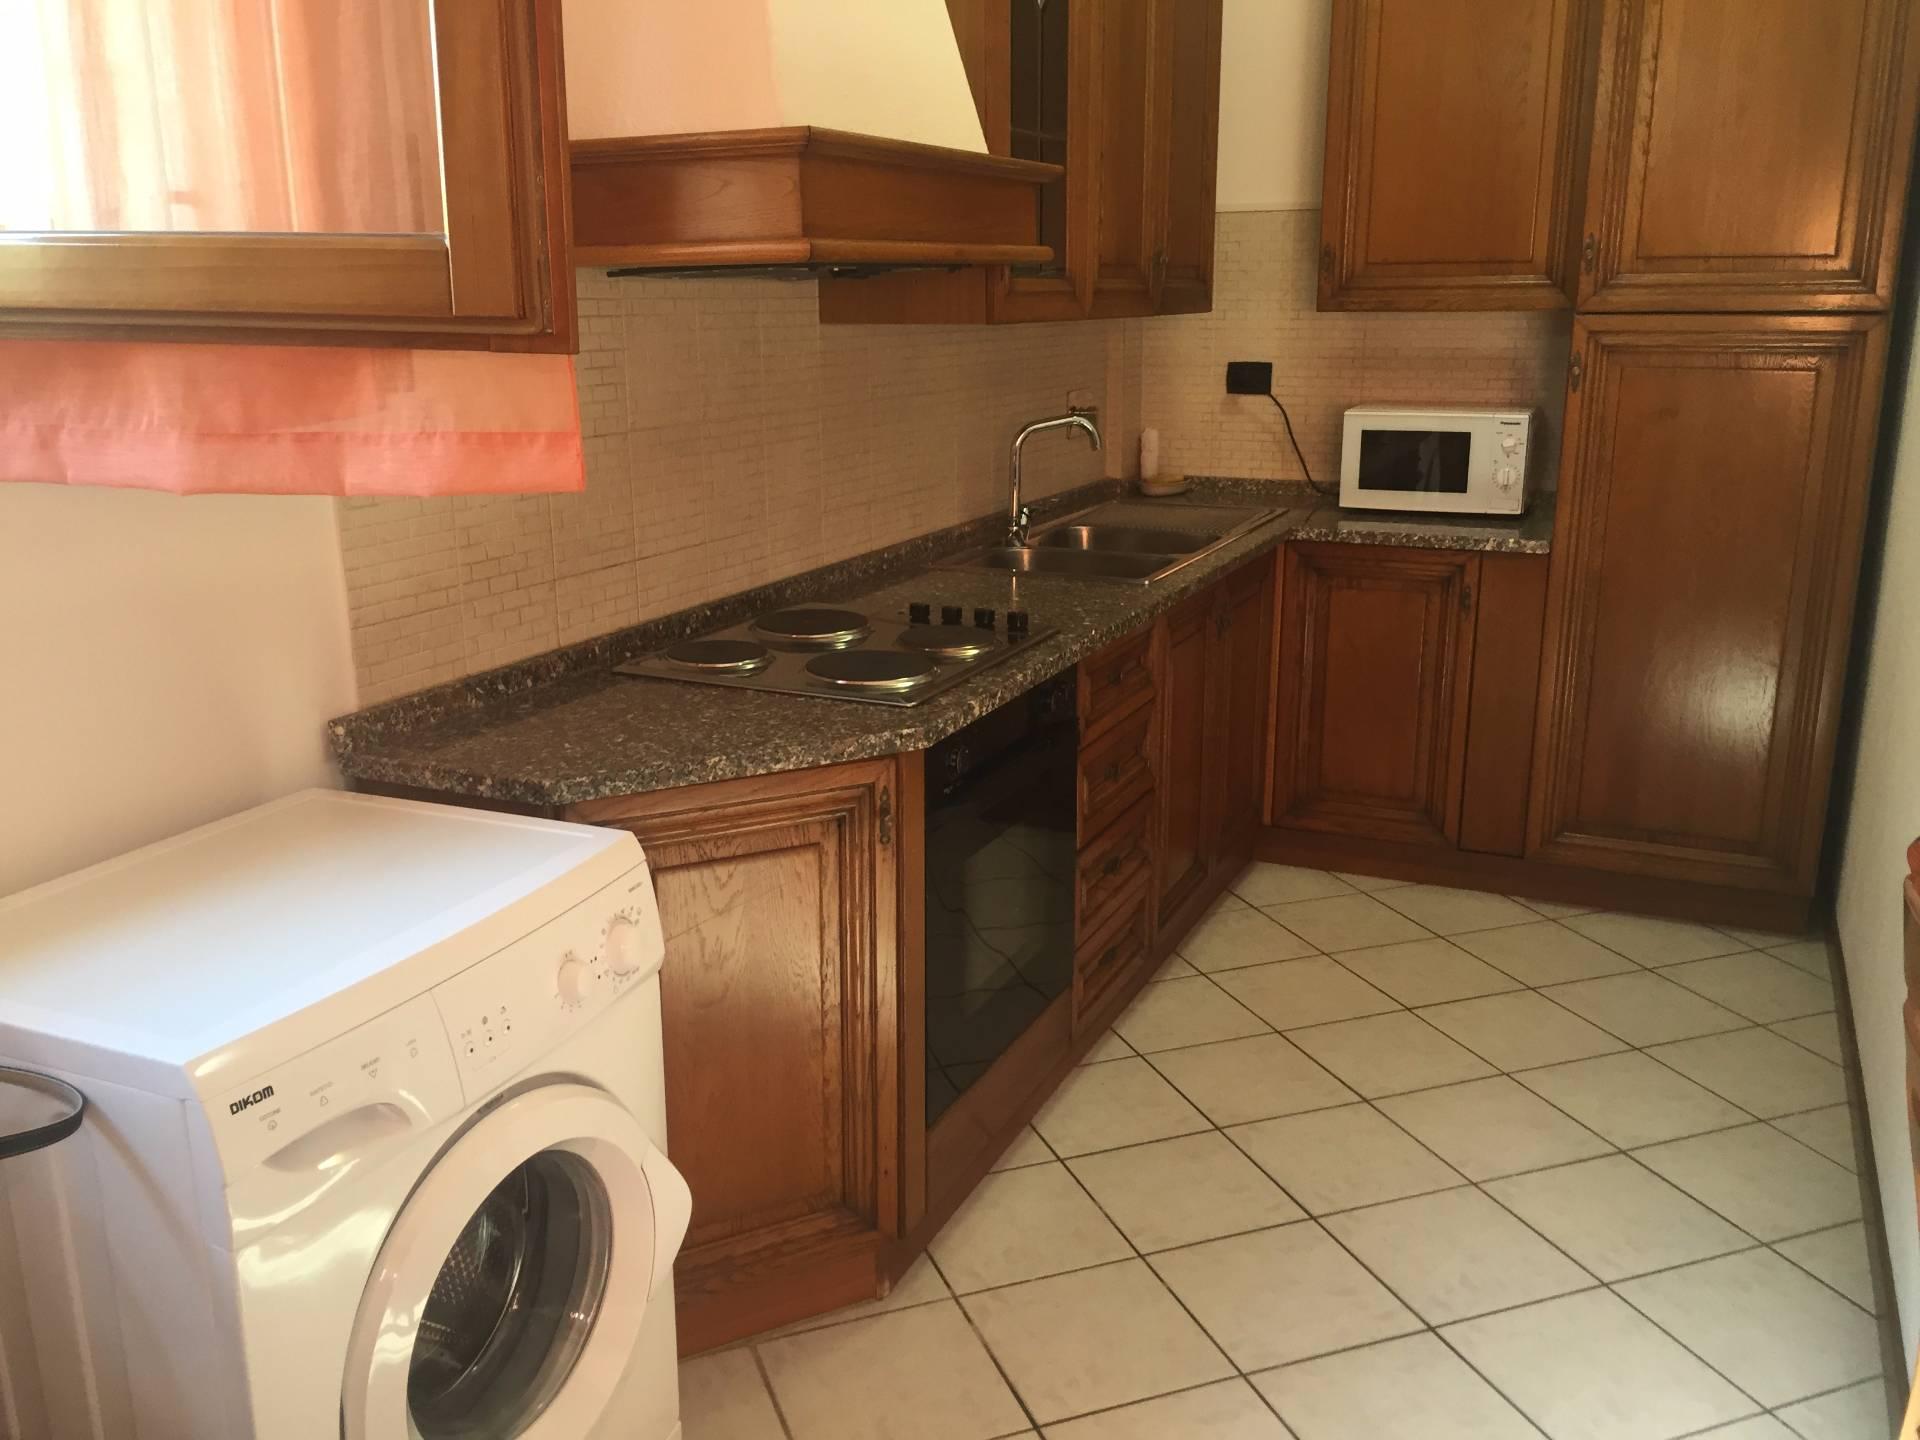 affitto appartamento castelfiorentino 1 32  300 €